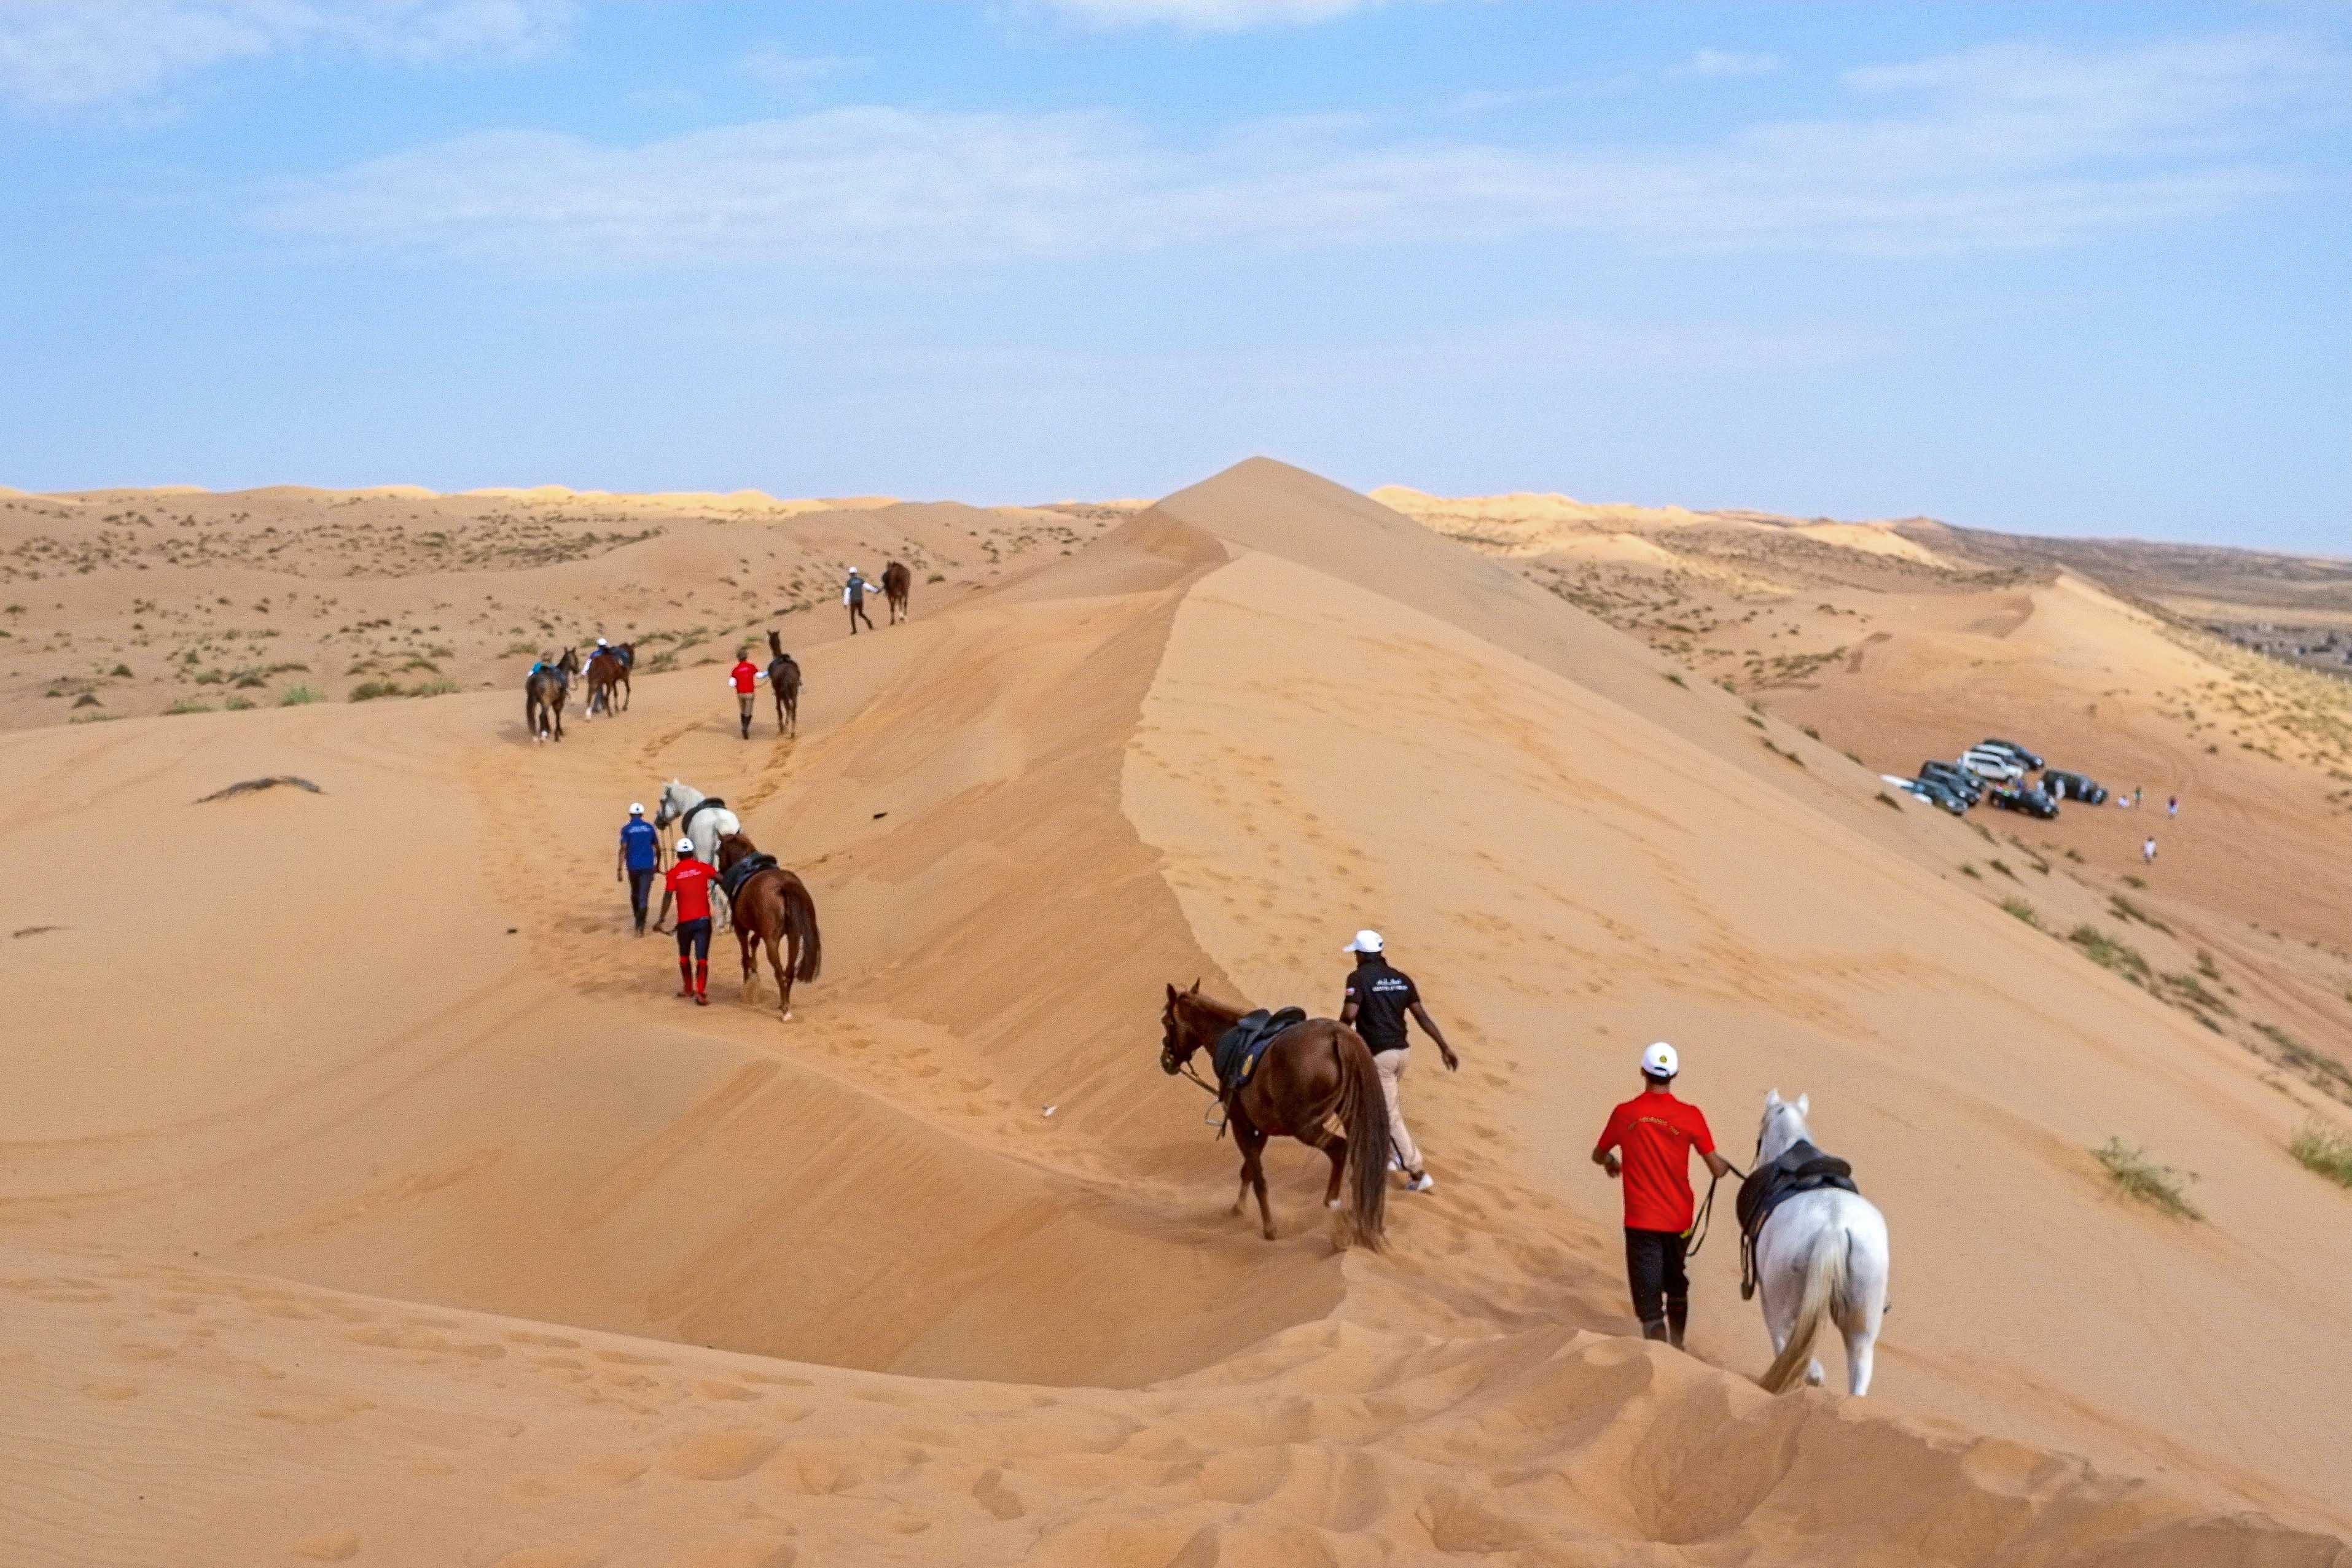 Tourisme Raid aventure : Les Gallops of Jordan GallopsArchive